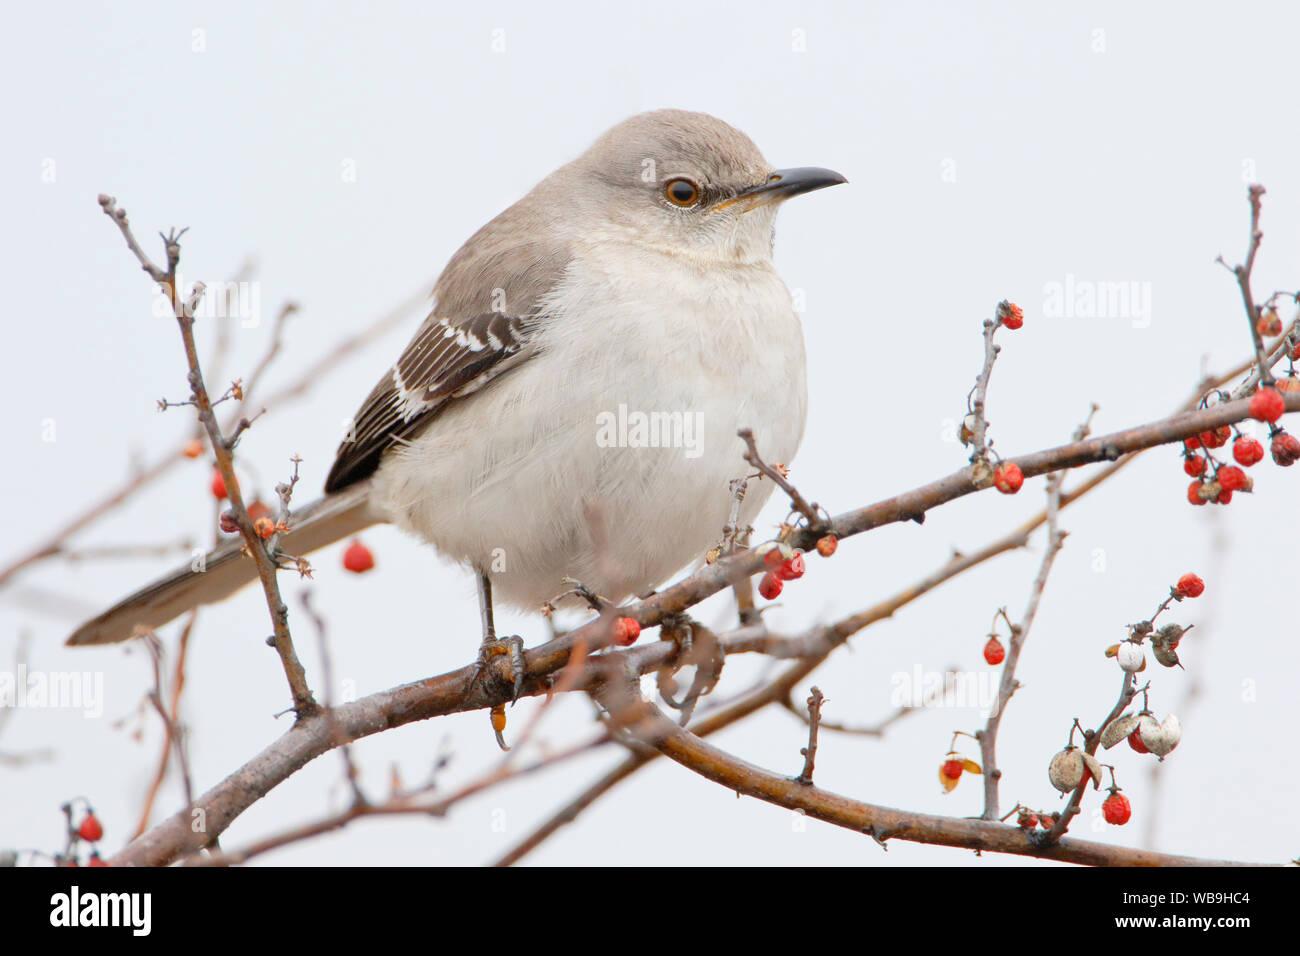 Northern Mockingbird (Mimus polyglottos) on branch at Jones State Park, New York, USA Stock Photo